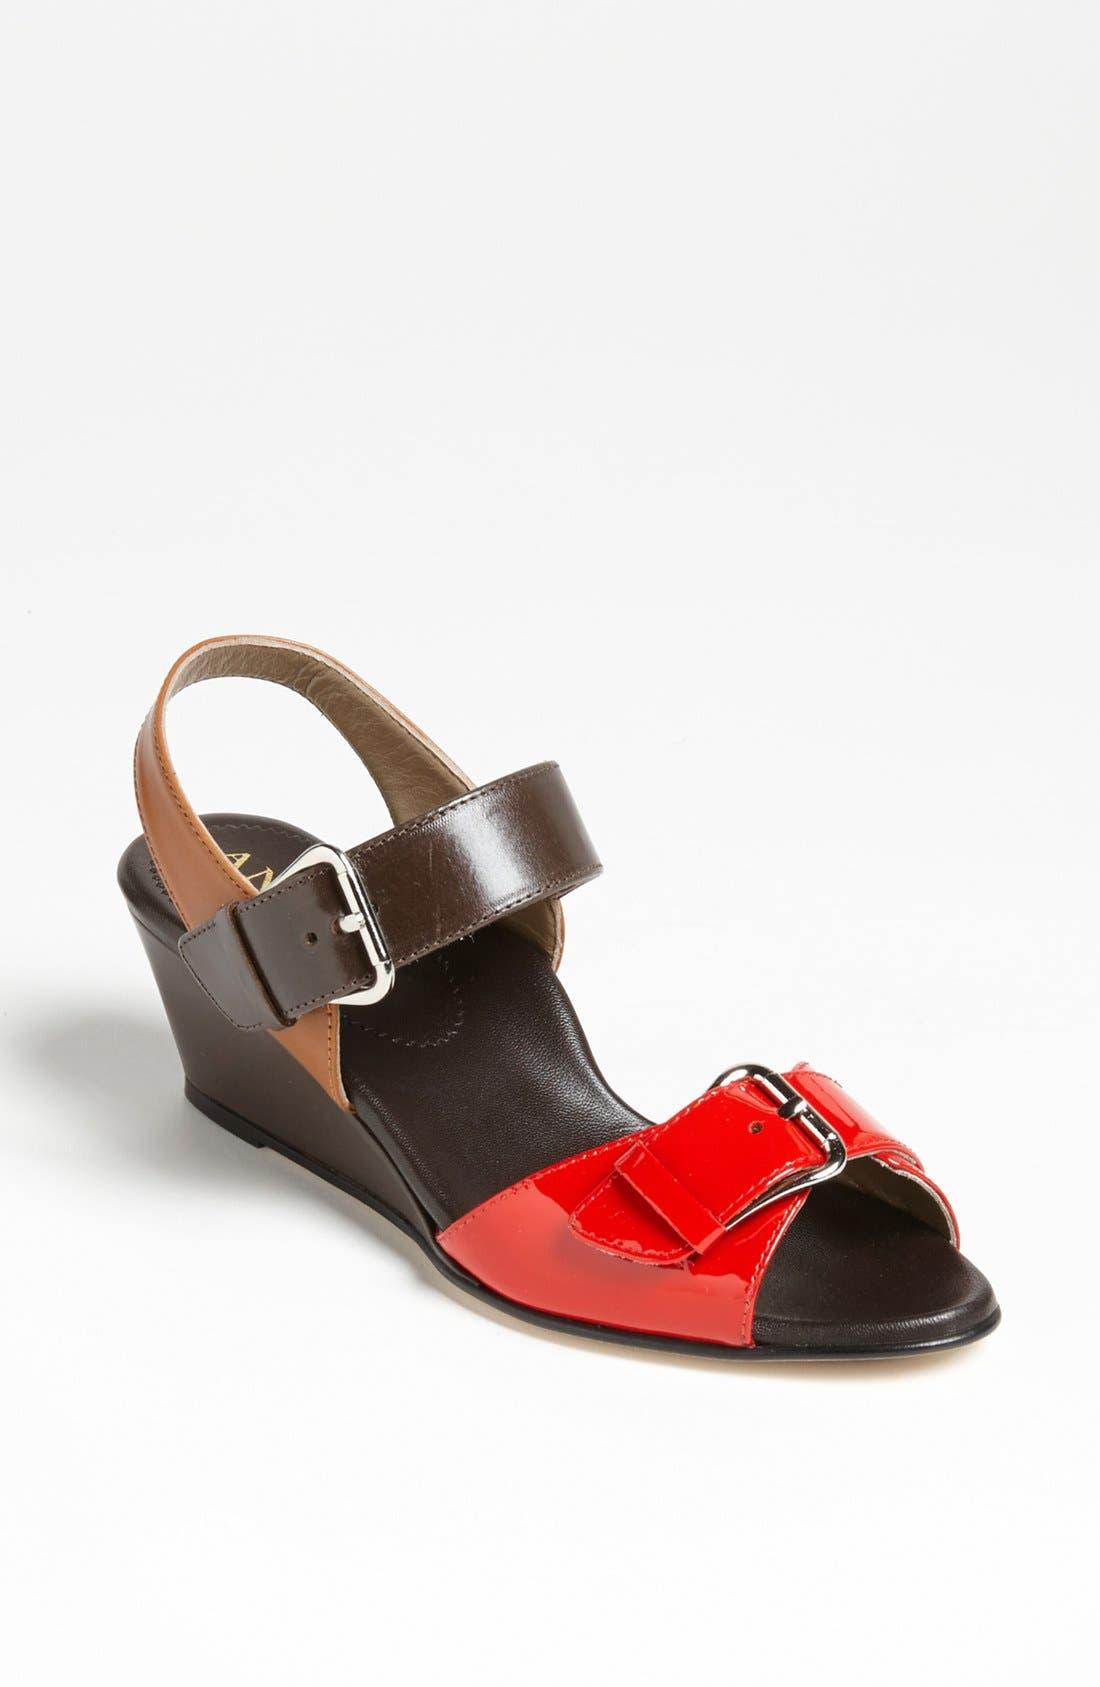 Alternate Image 1 Selected - Anyi Lu 'Daisy' Sandal